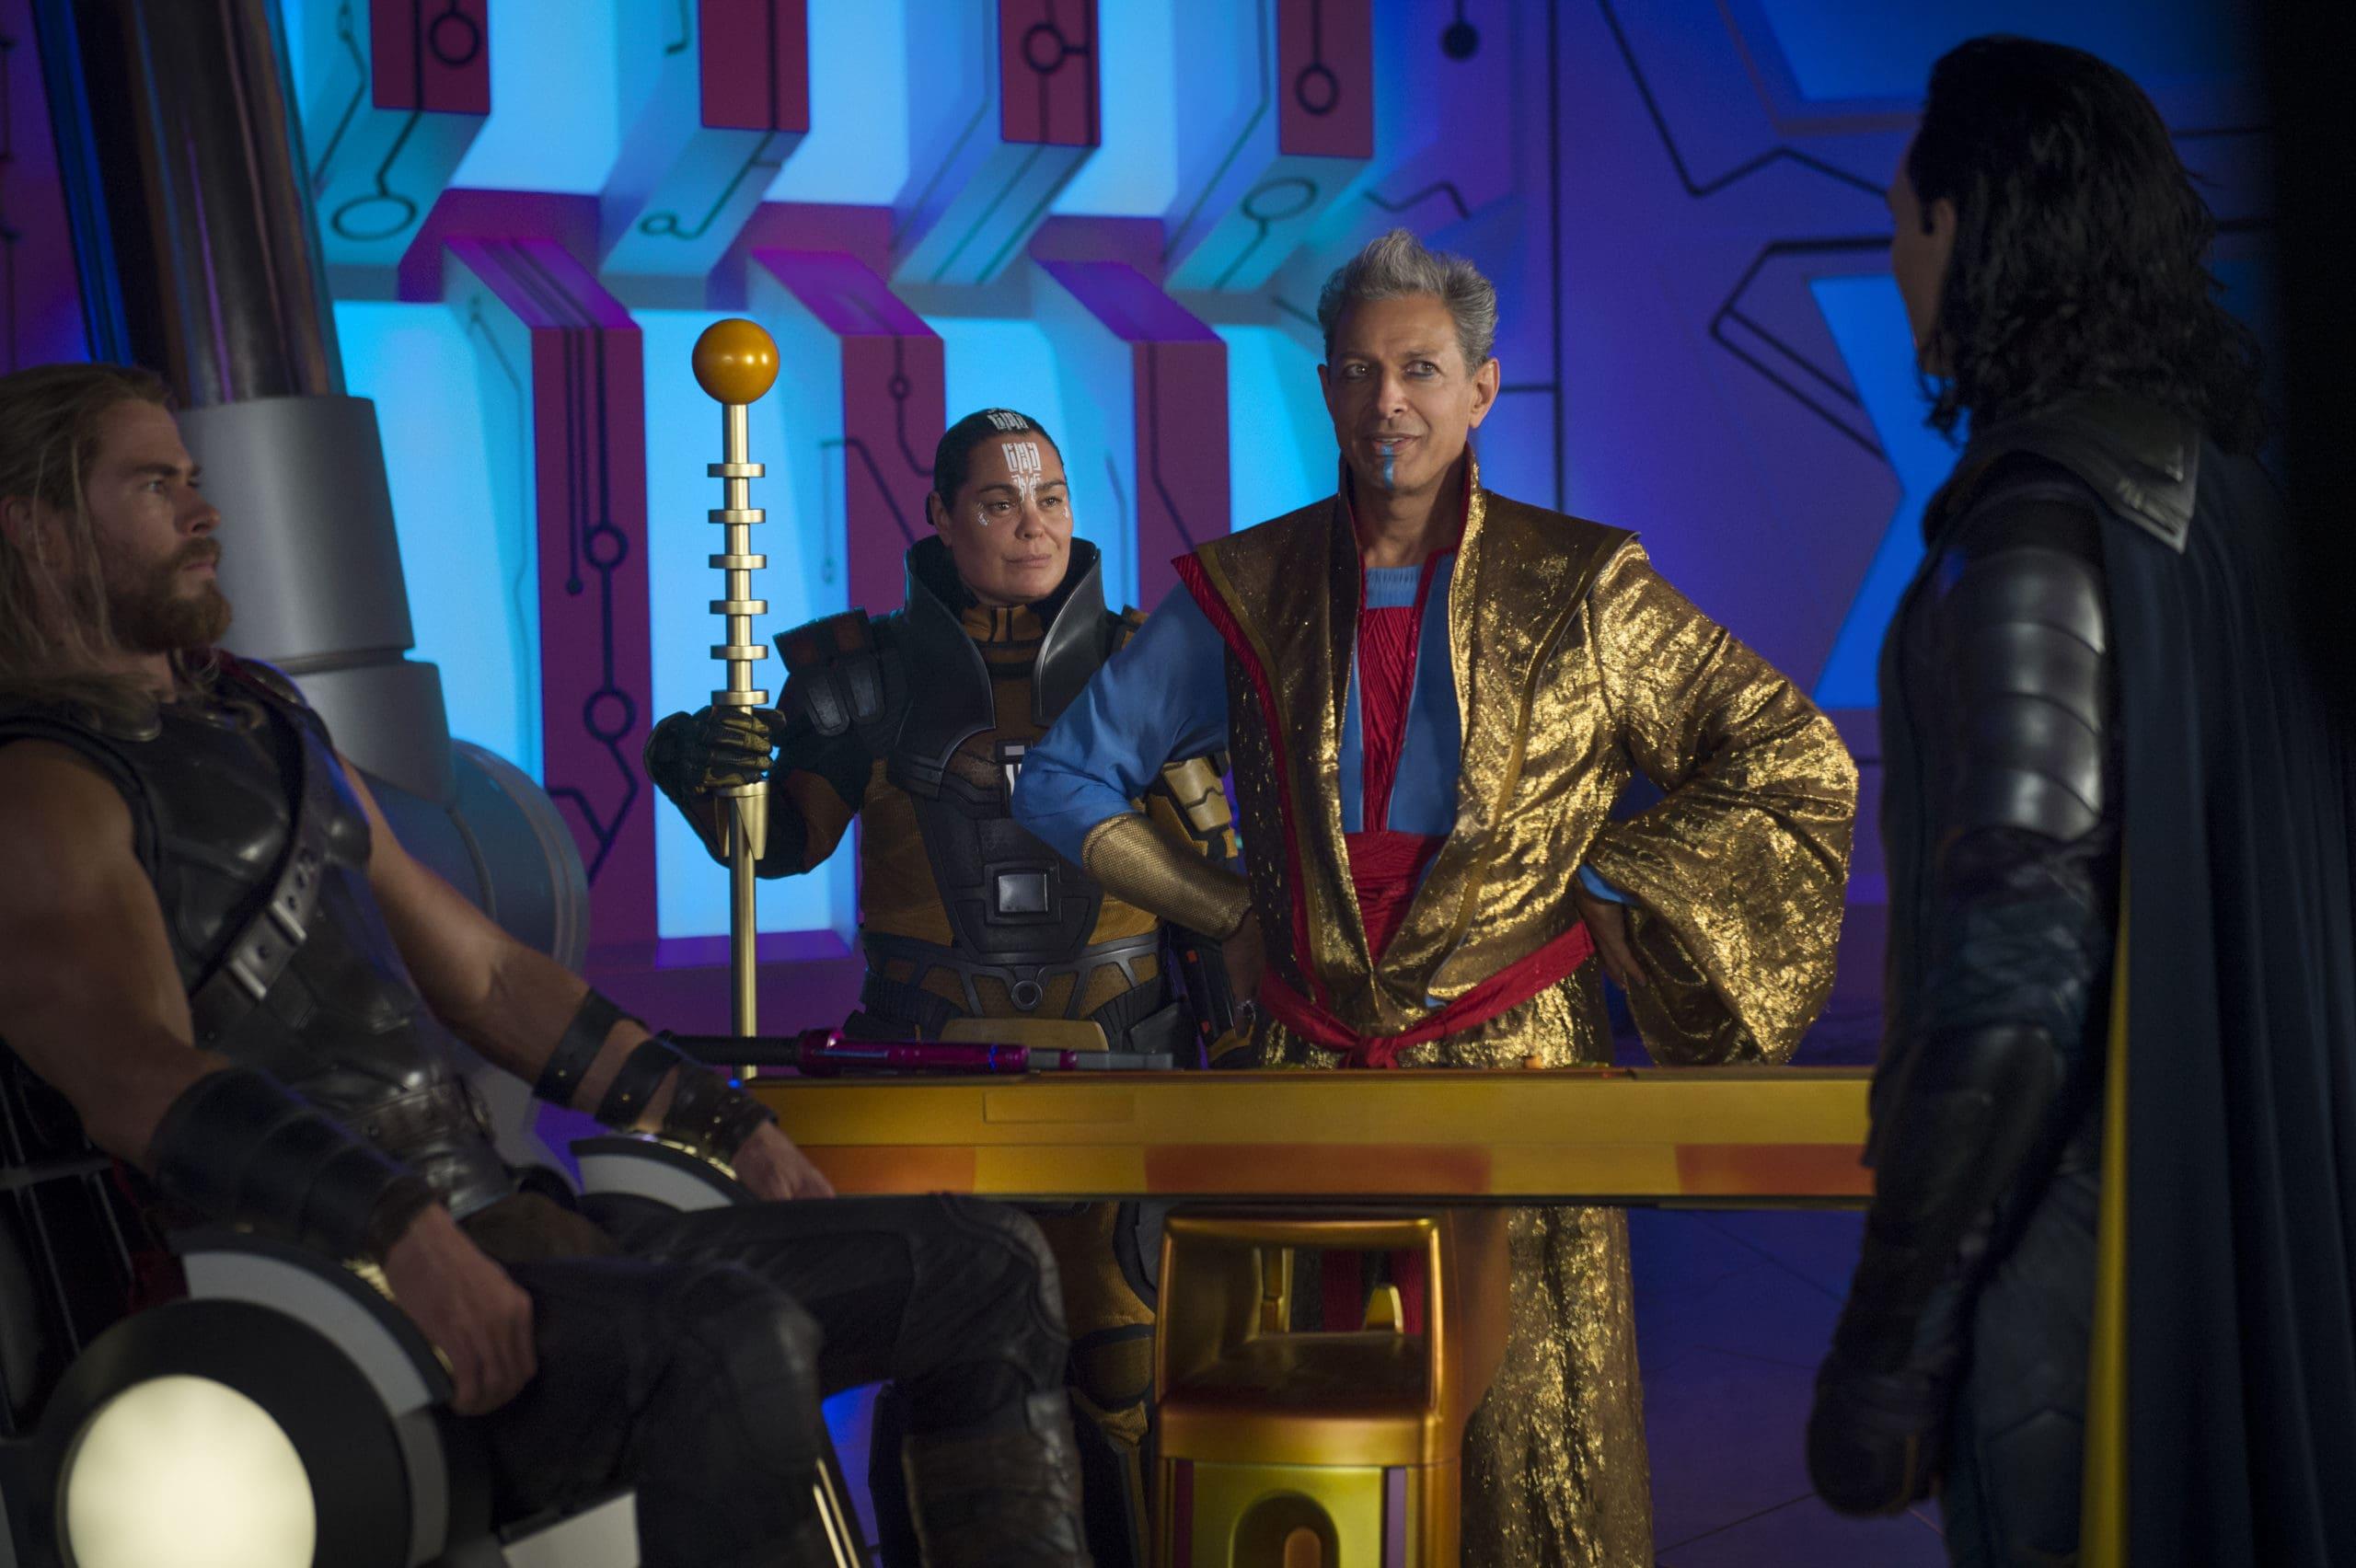 Marvel Studios Thor: Ragnarok..L to R: Thor (Chris Hemsworth), Topaz (Rachel House), Grandmaster (Jeff Goldblum) and Loki (Tom Hiddleston)..Photo: Jasin Boland..©Marvel Studios 2017